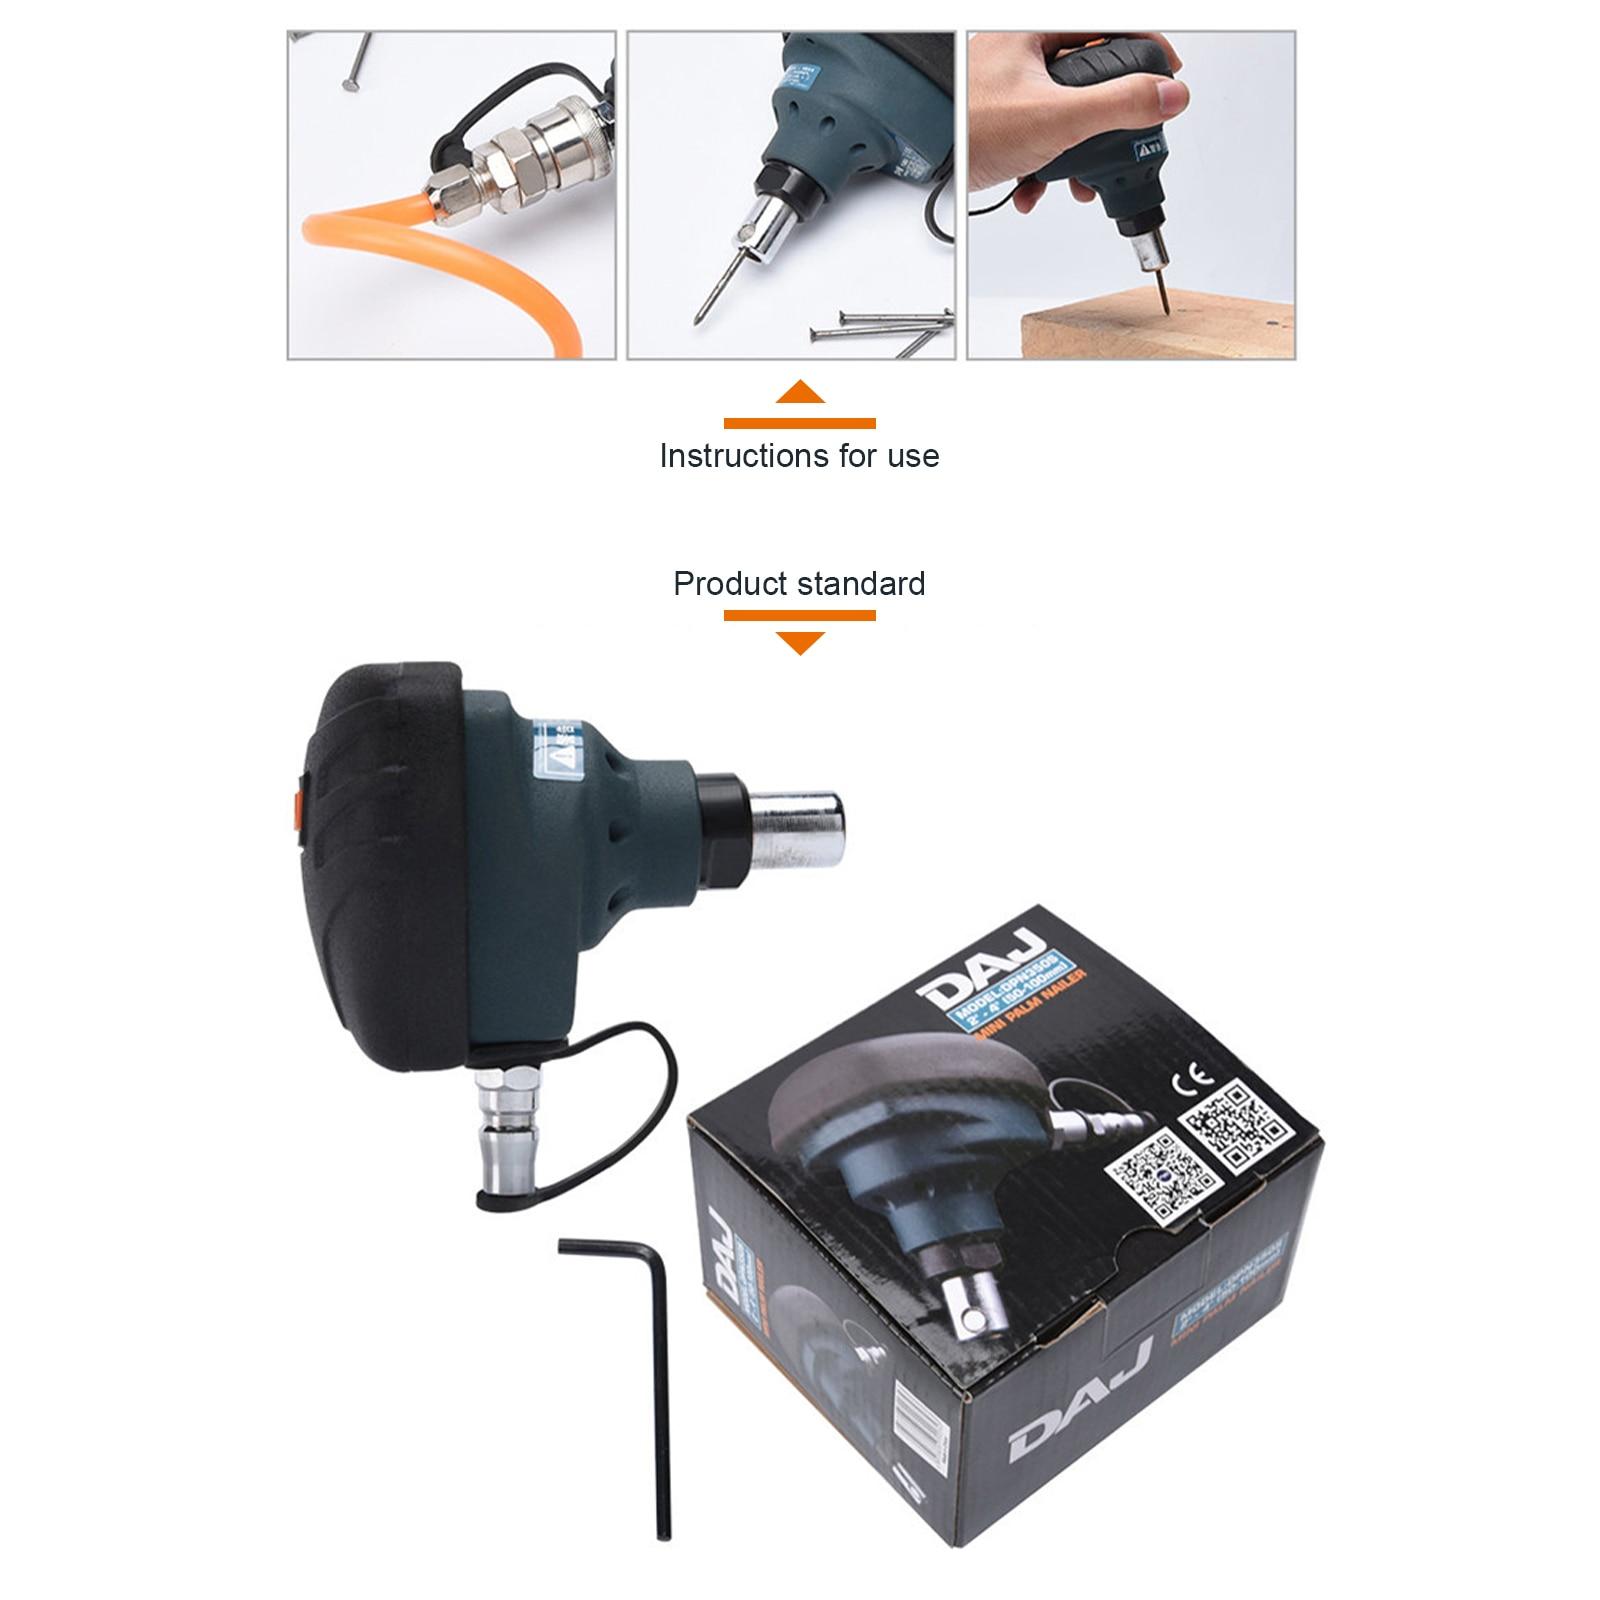 Pneumatic Hammer Nailing Machine Mini Air Nailer Steel Nail Palm Hammer Pneumatic Palm Hammer Woodworking Tool  - buy with discount